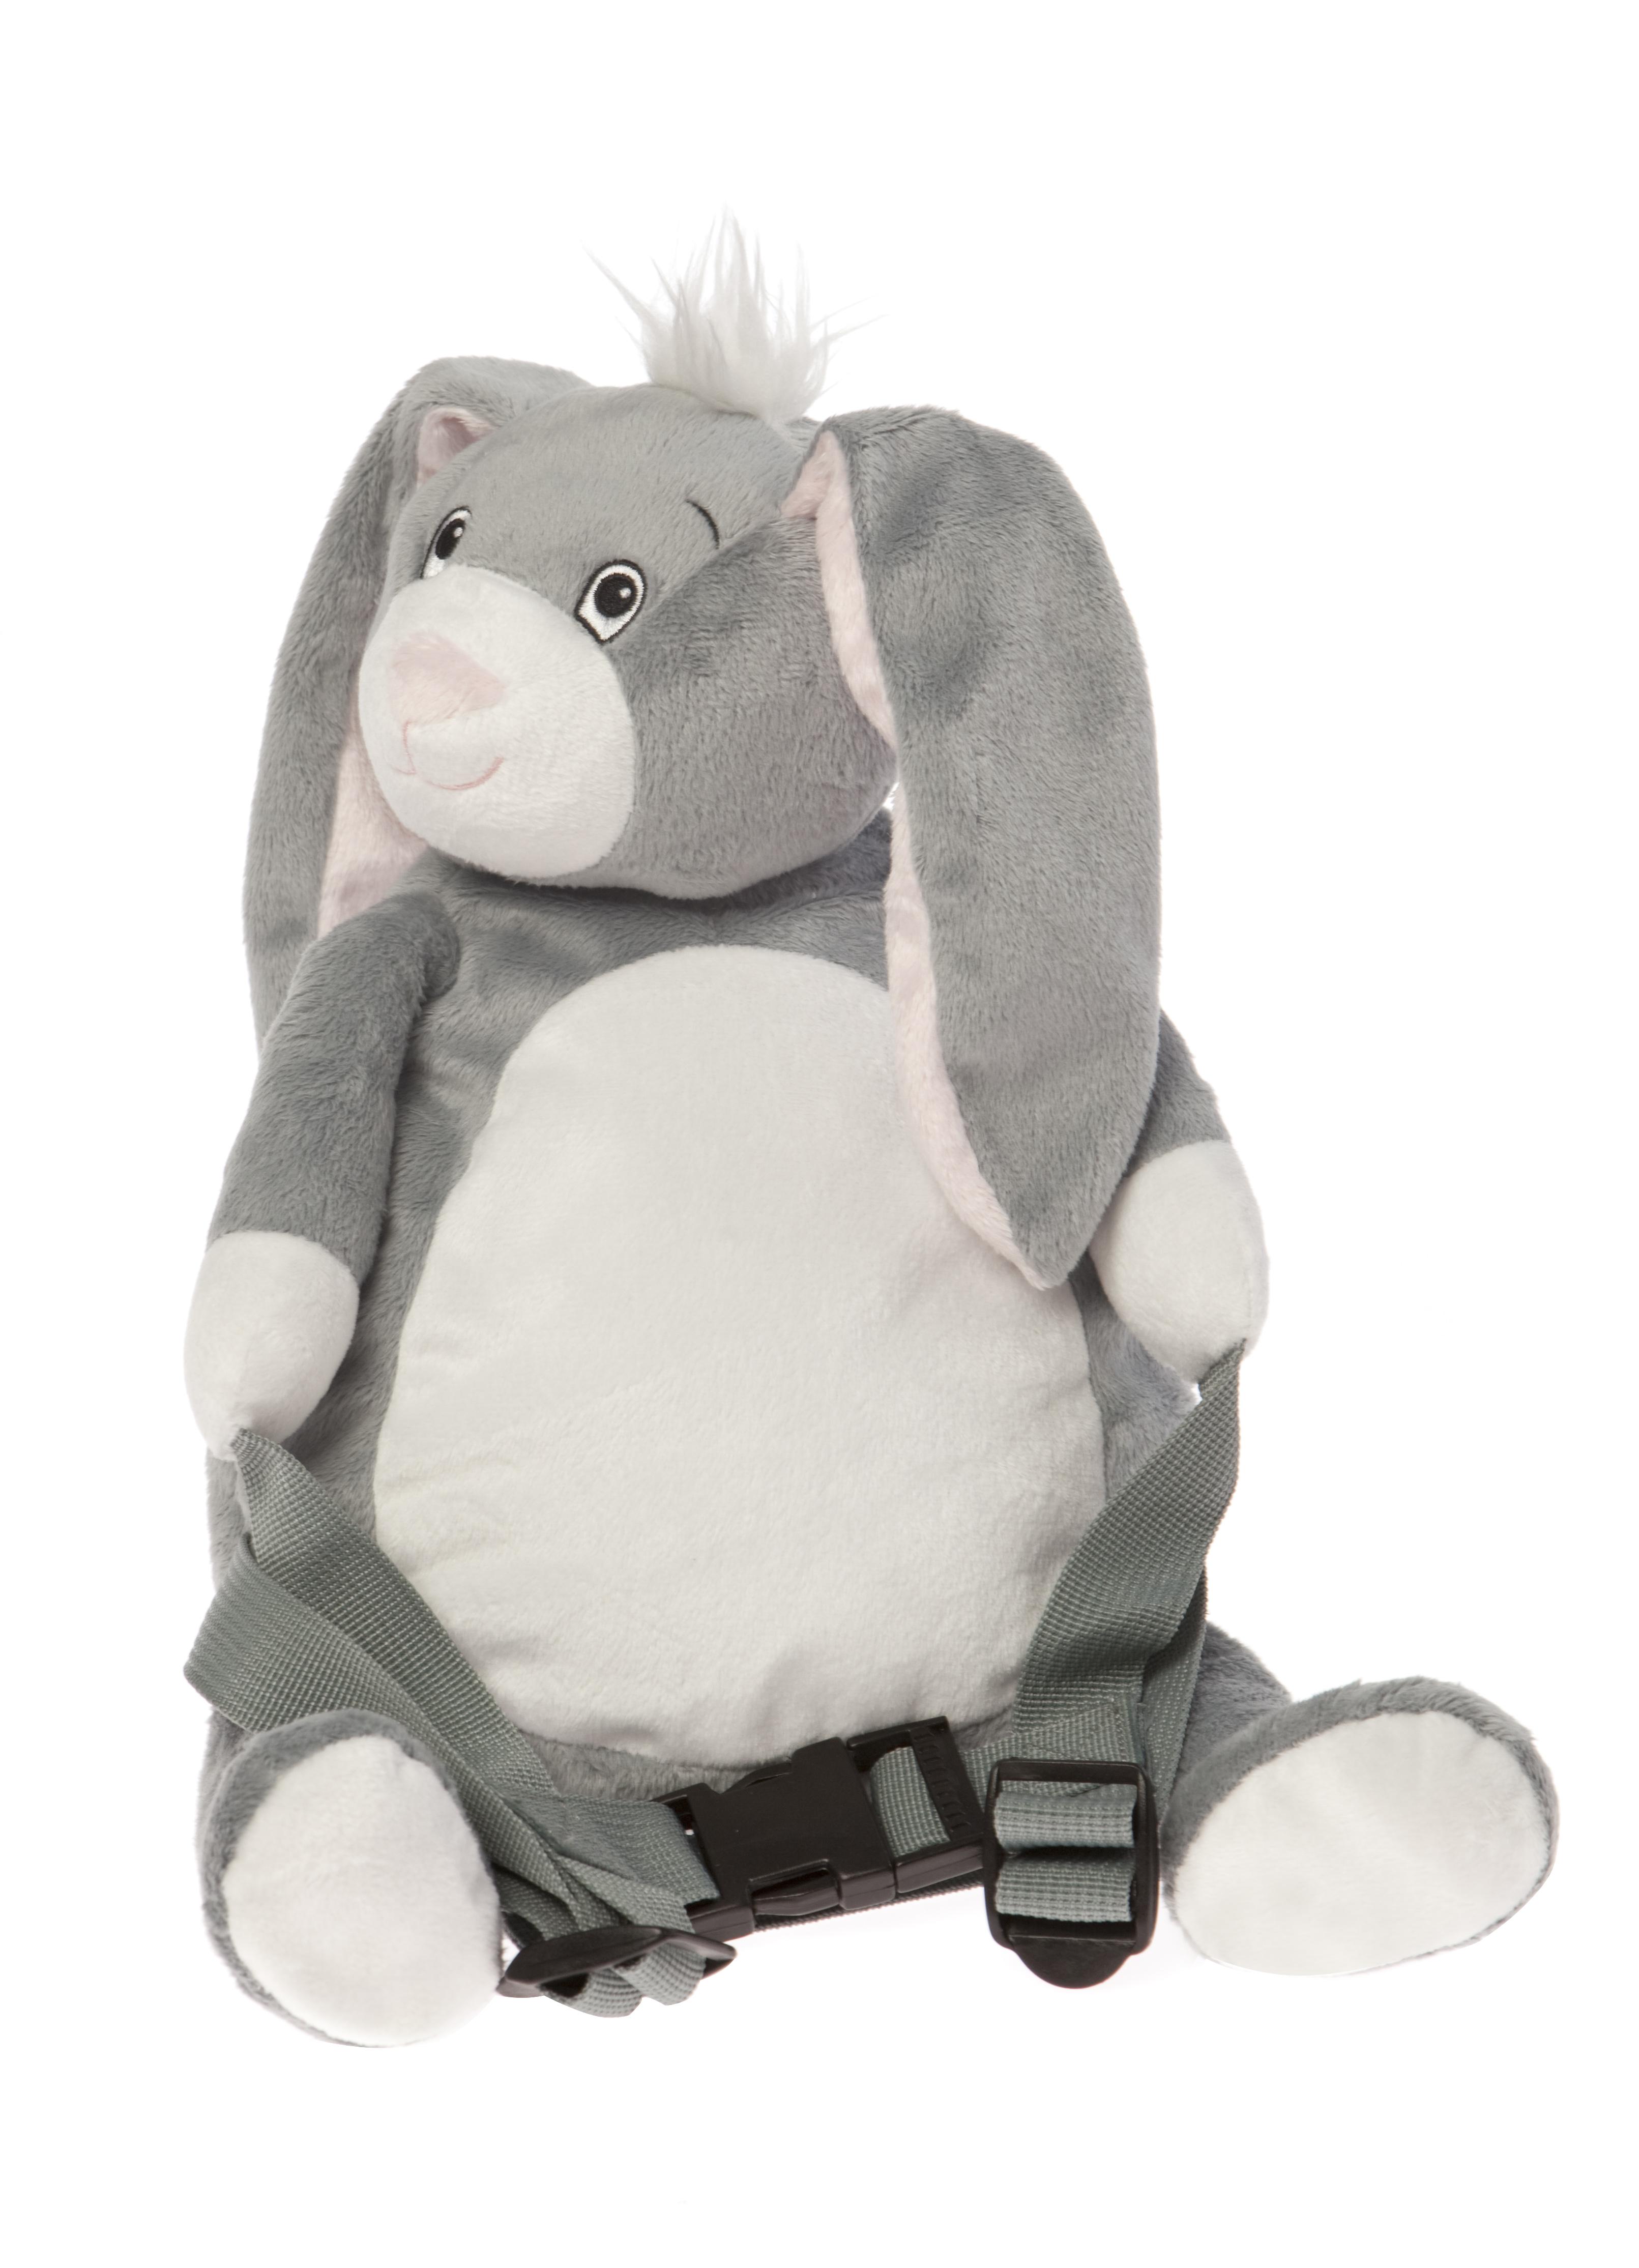 HipHop+the+Bunny.jpg